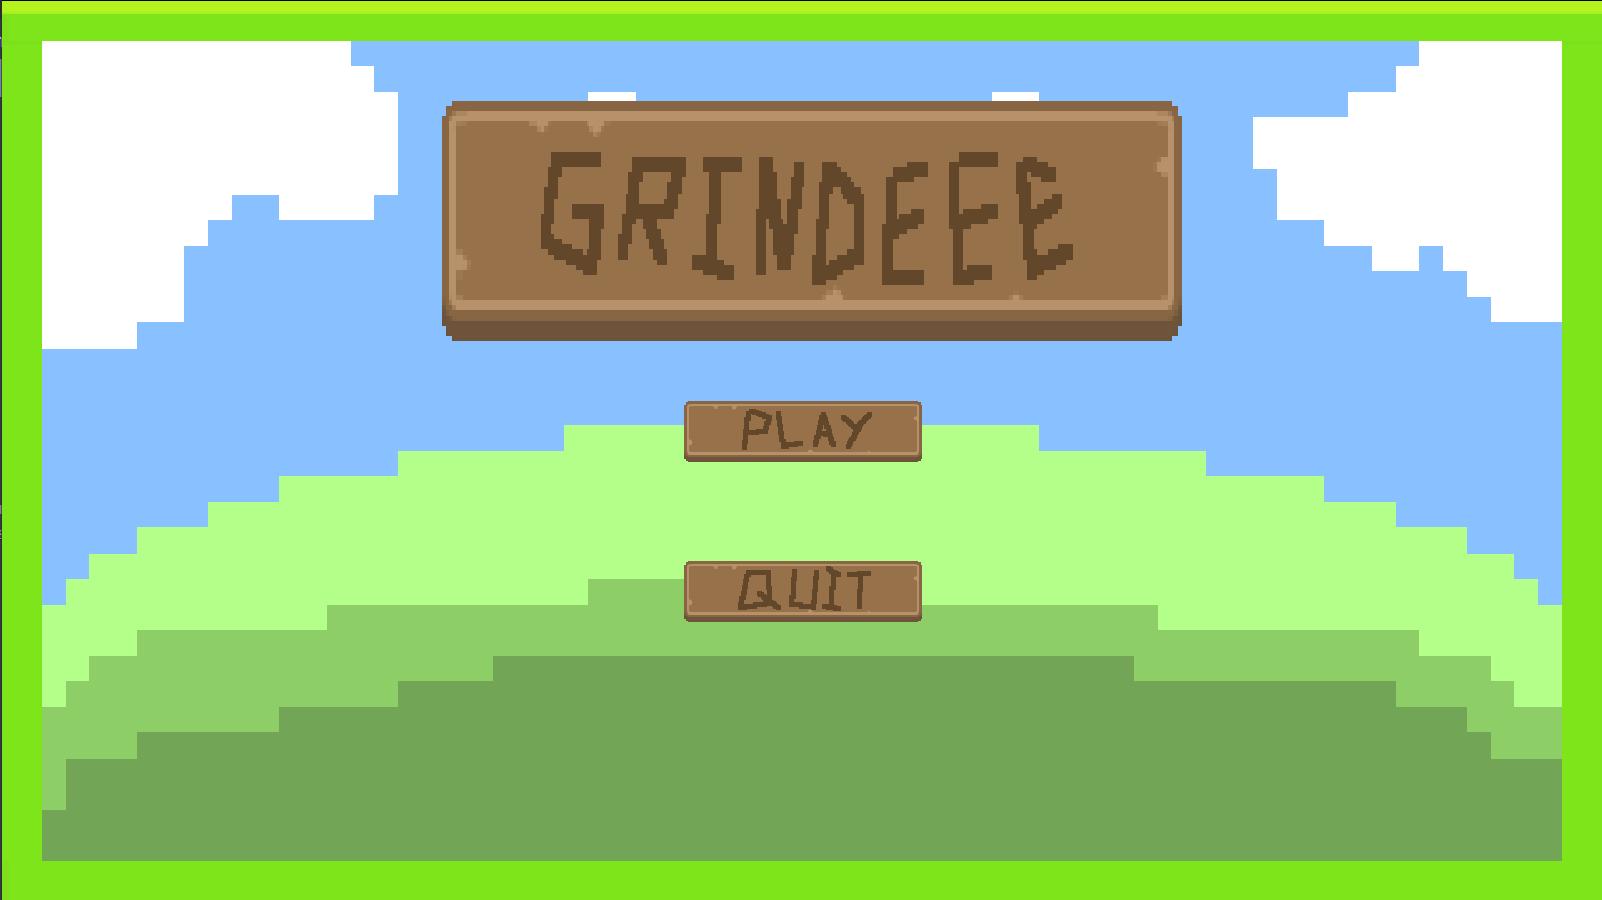 Grindeee